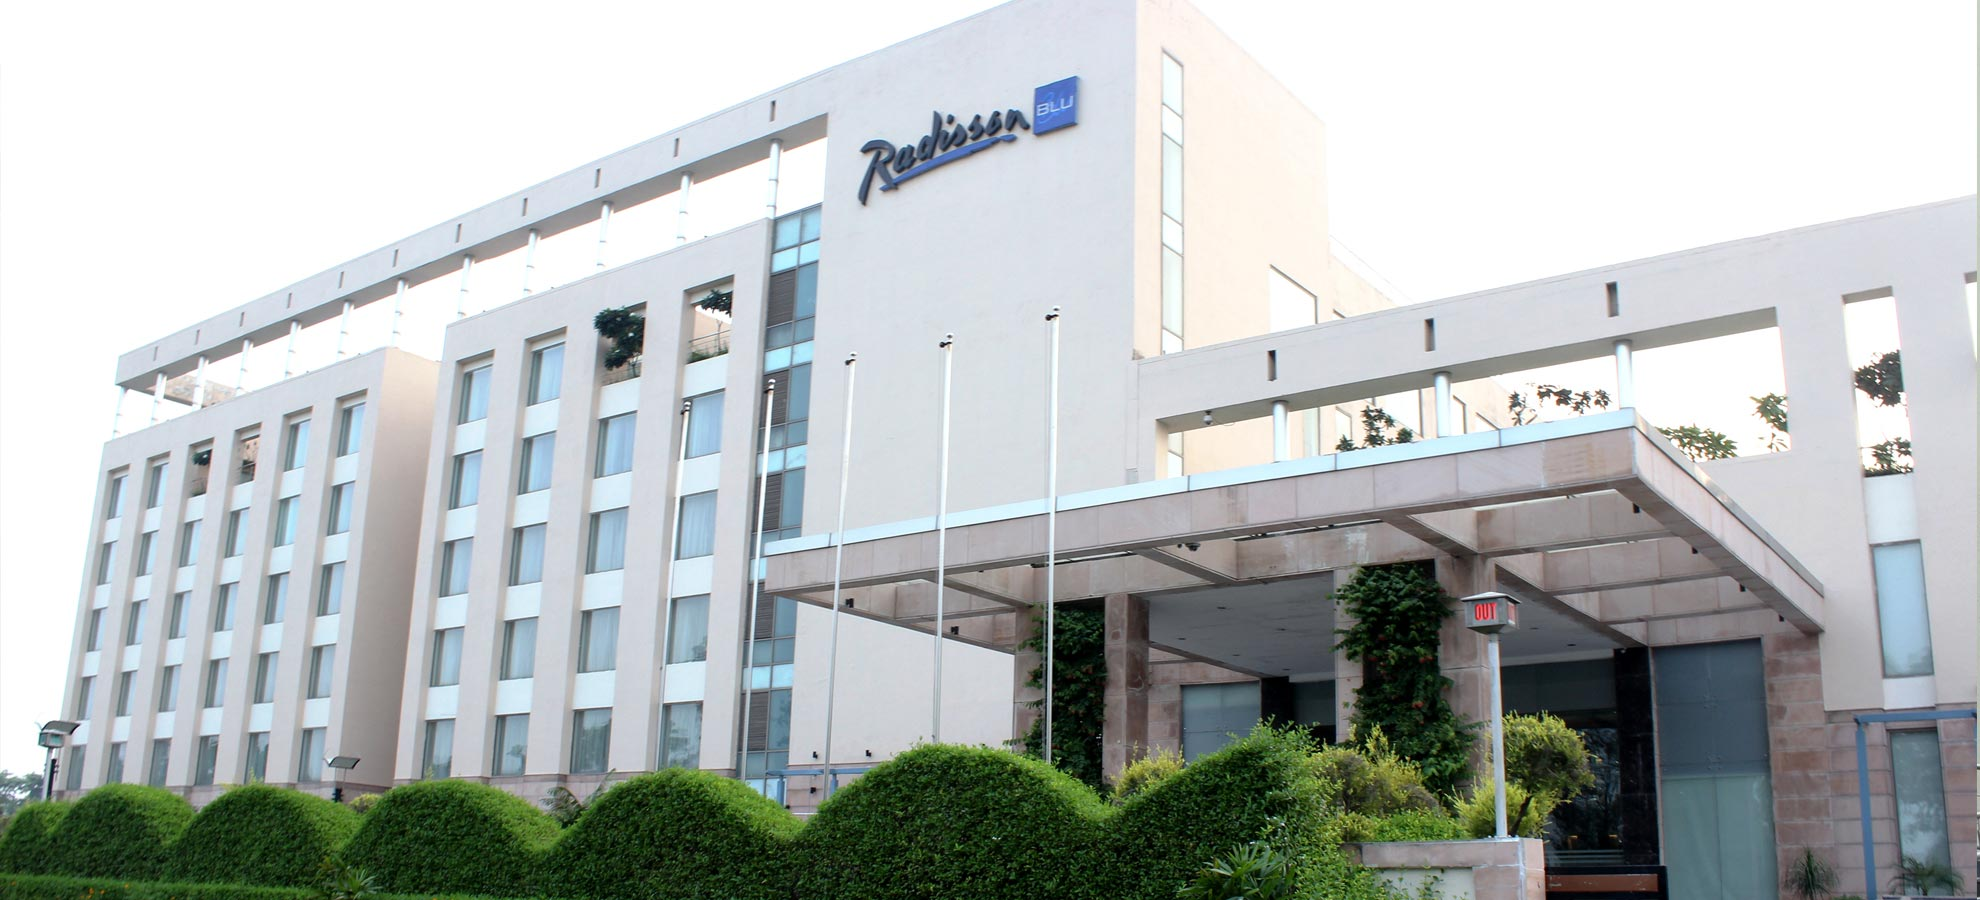 Radission Blu Rudrapur